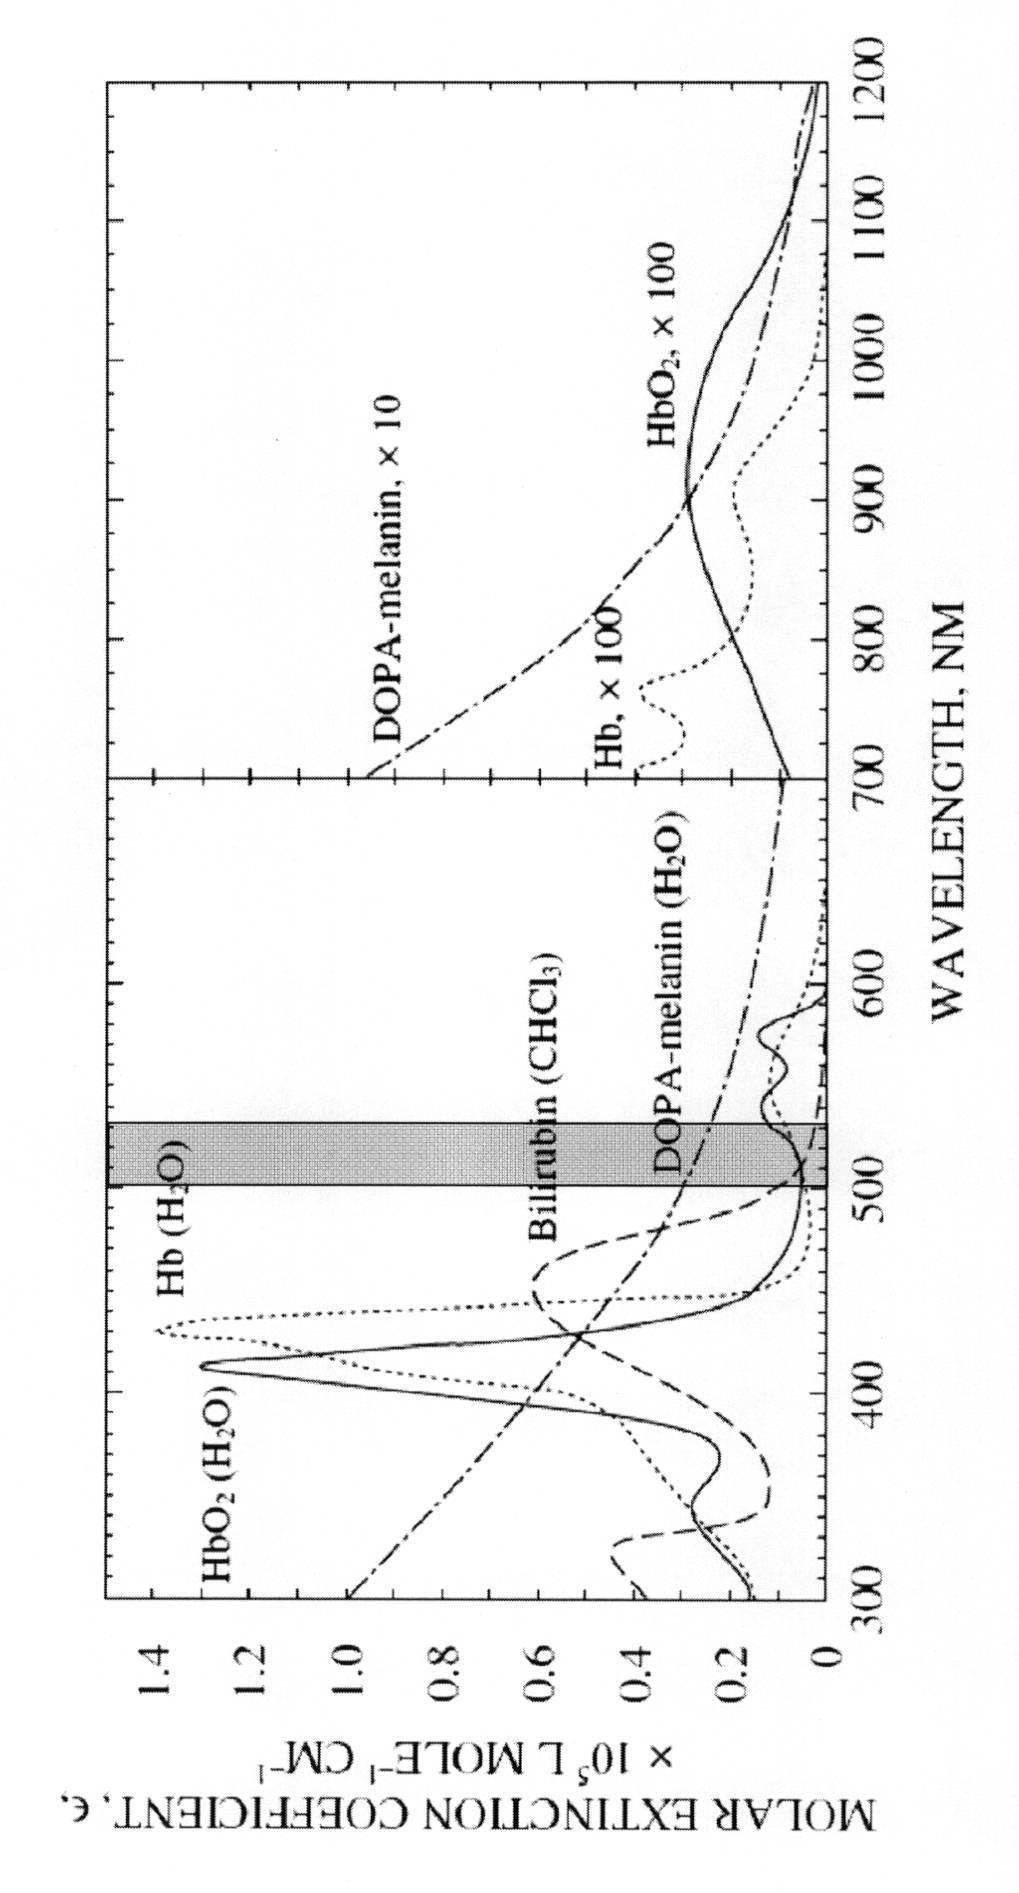 WO2013005379A1 - 光増感剤又は5-アミノレブリン酸類を用いる光線力学的治療          - Google PatentsFamily